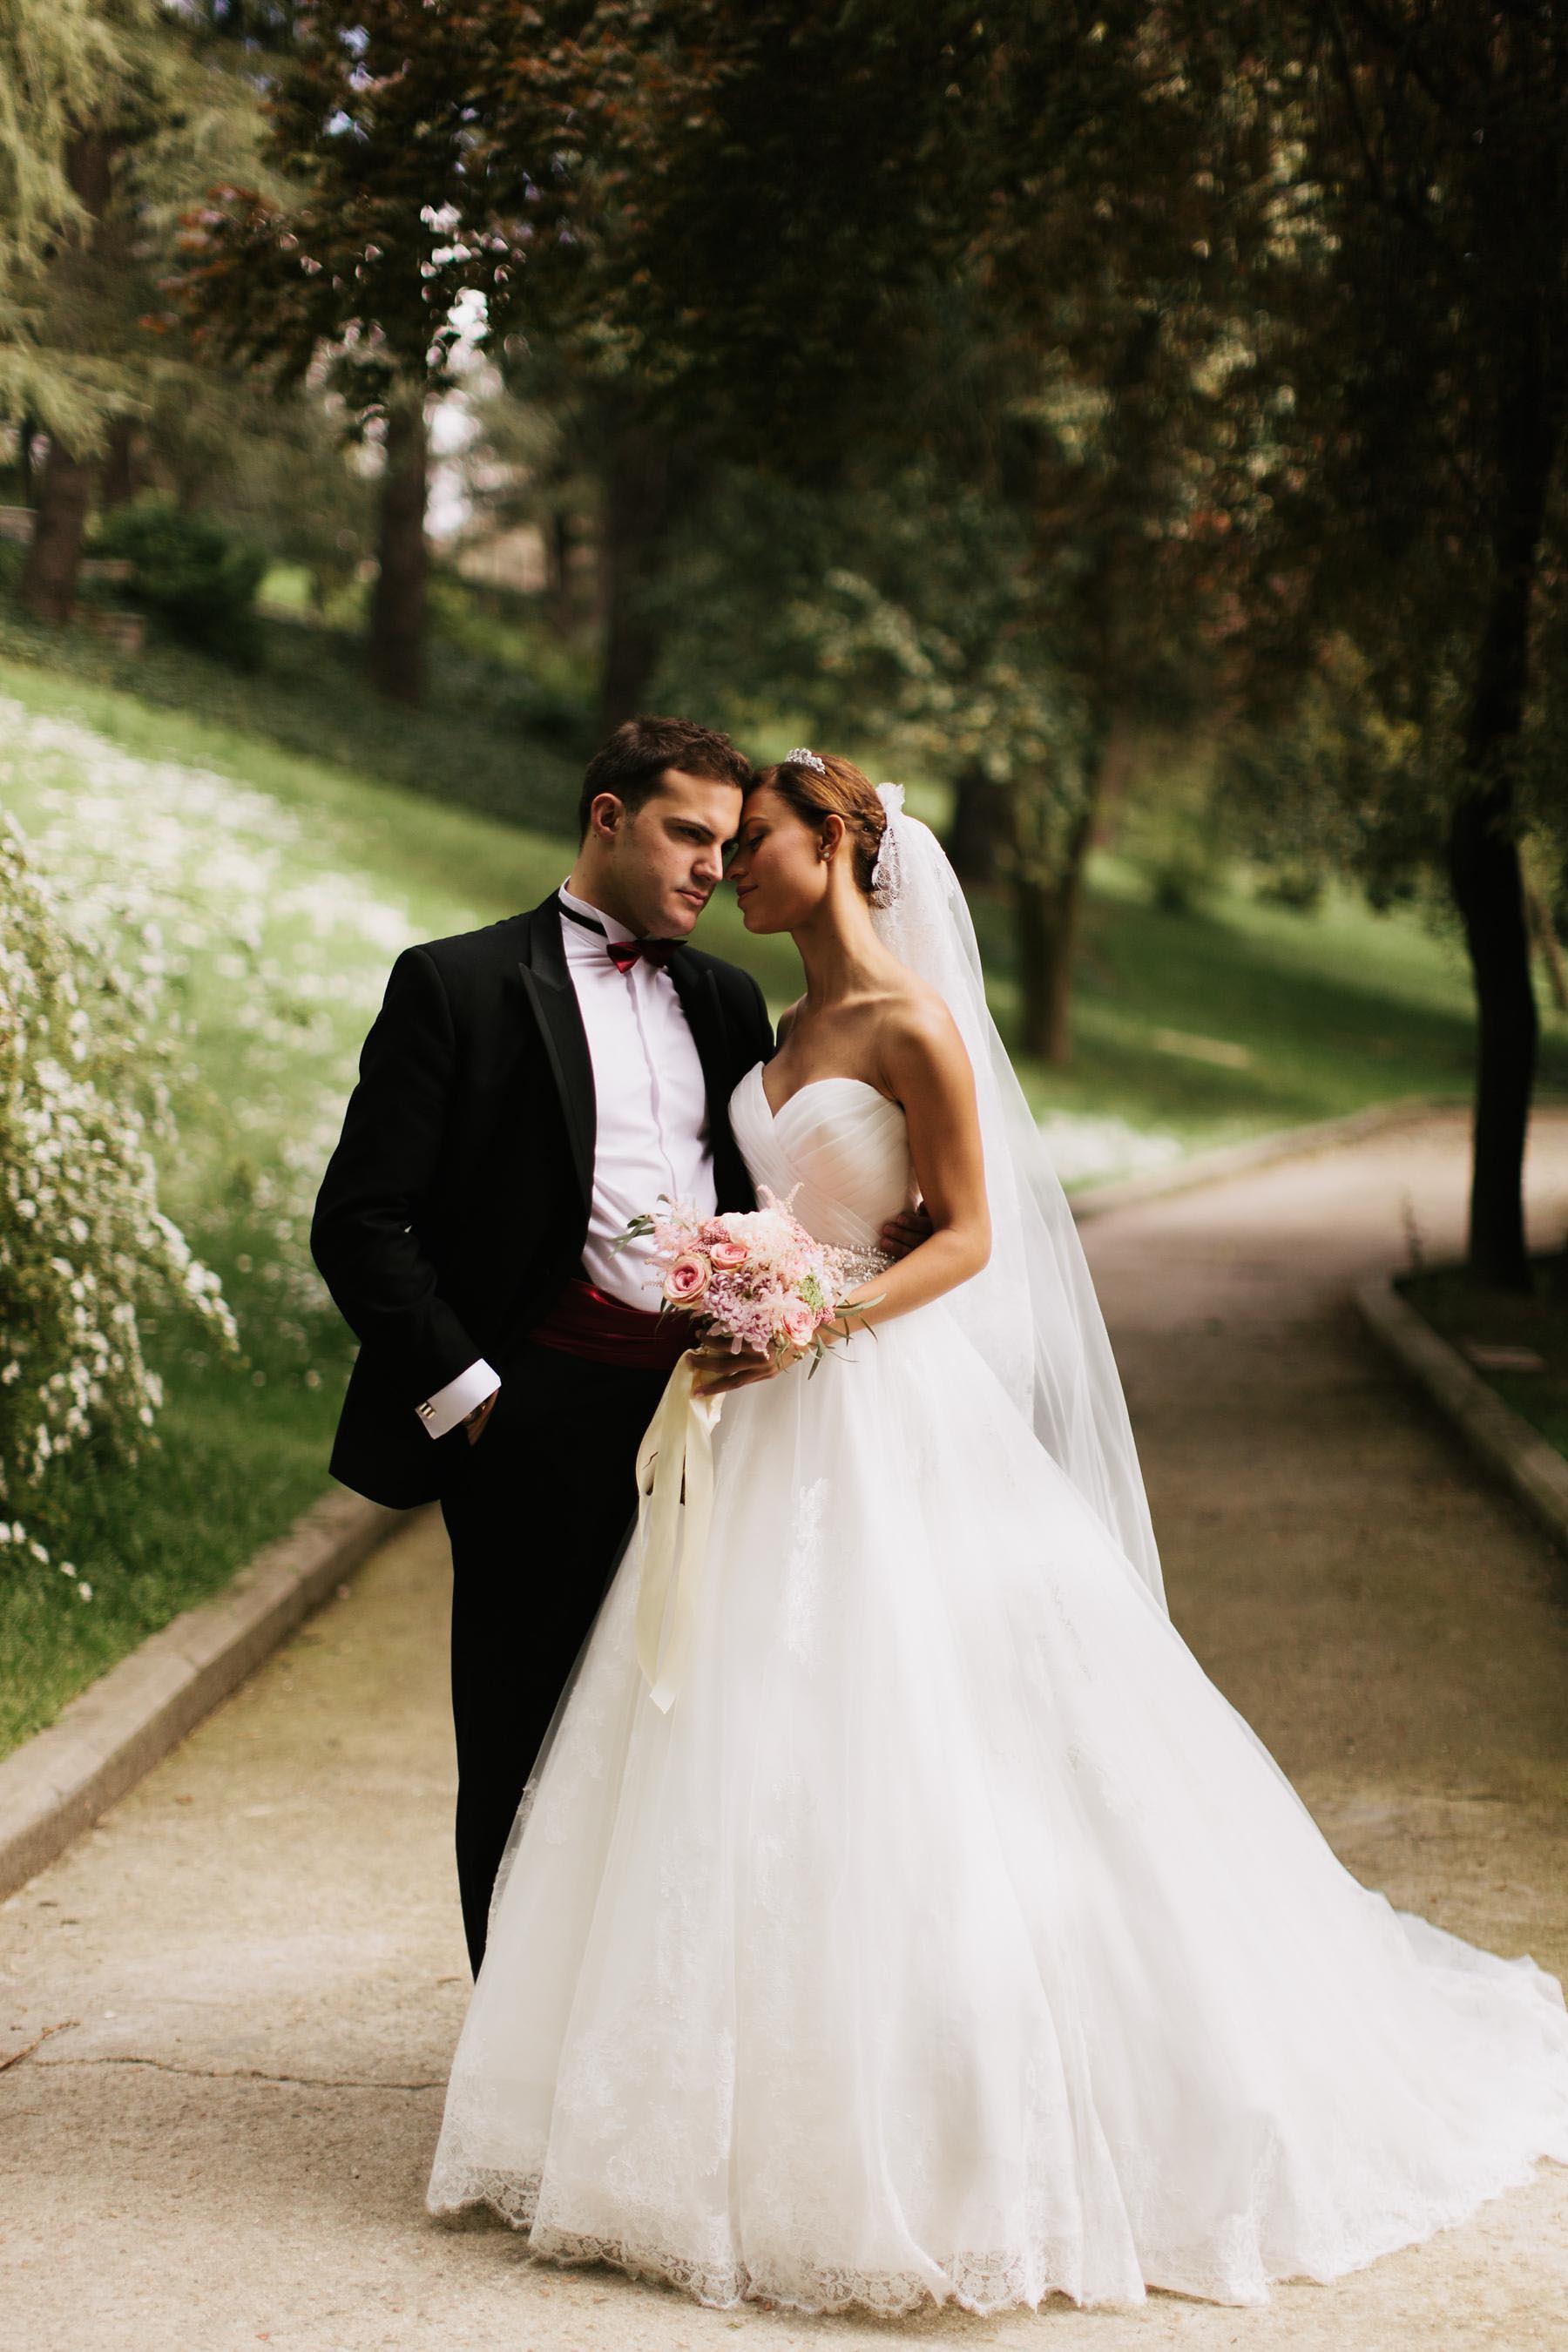 fotografo de bodas Jairo Crena-196